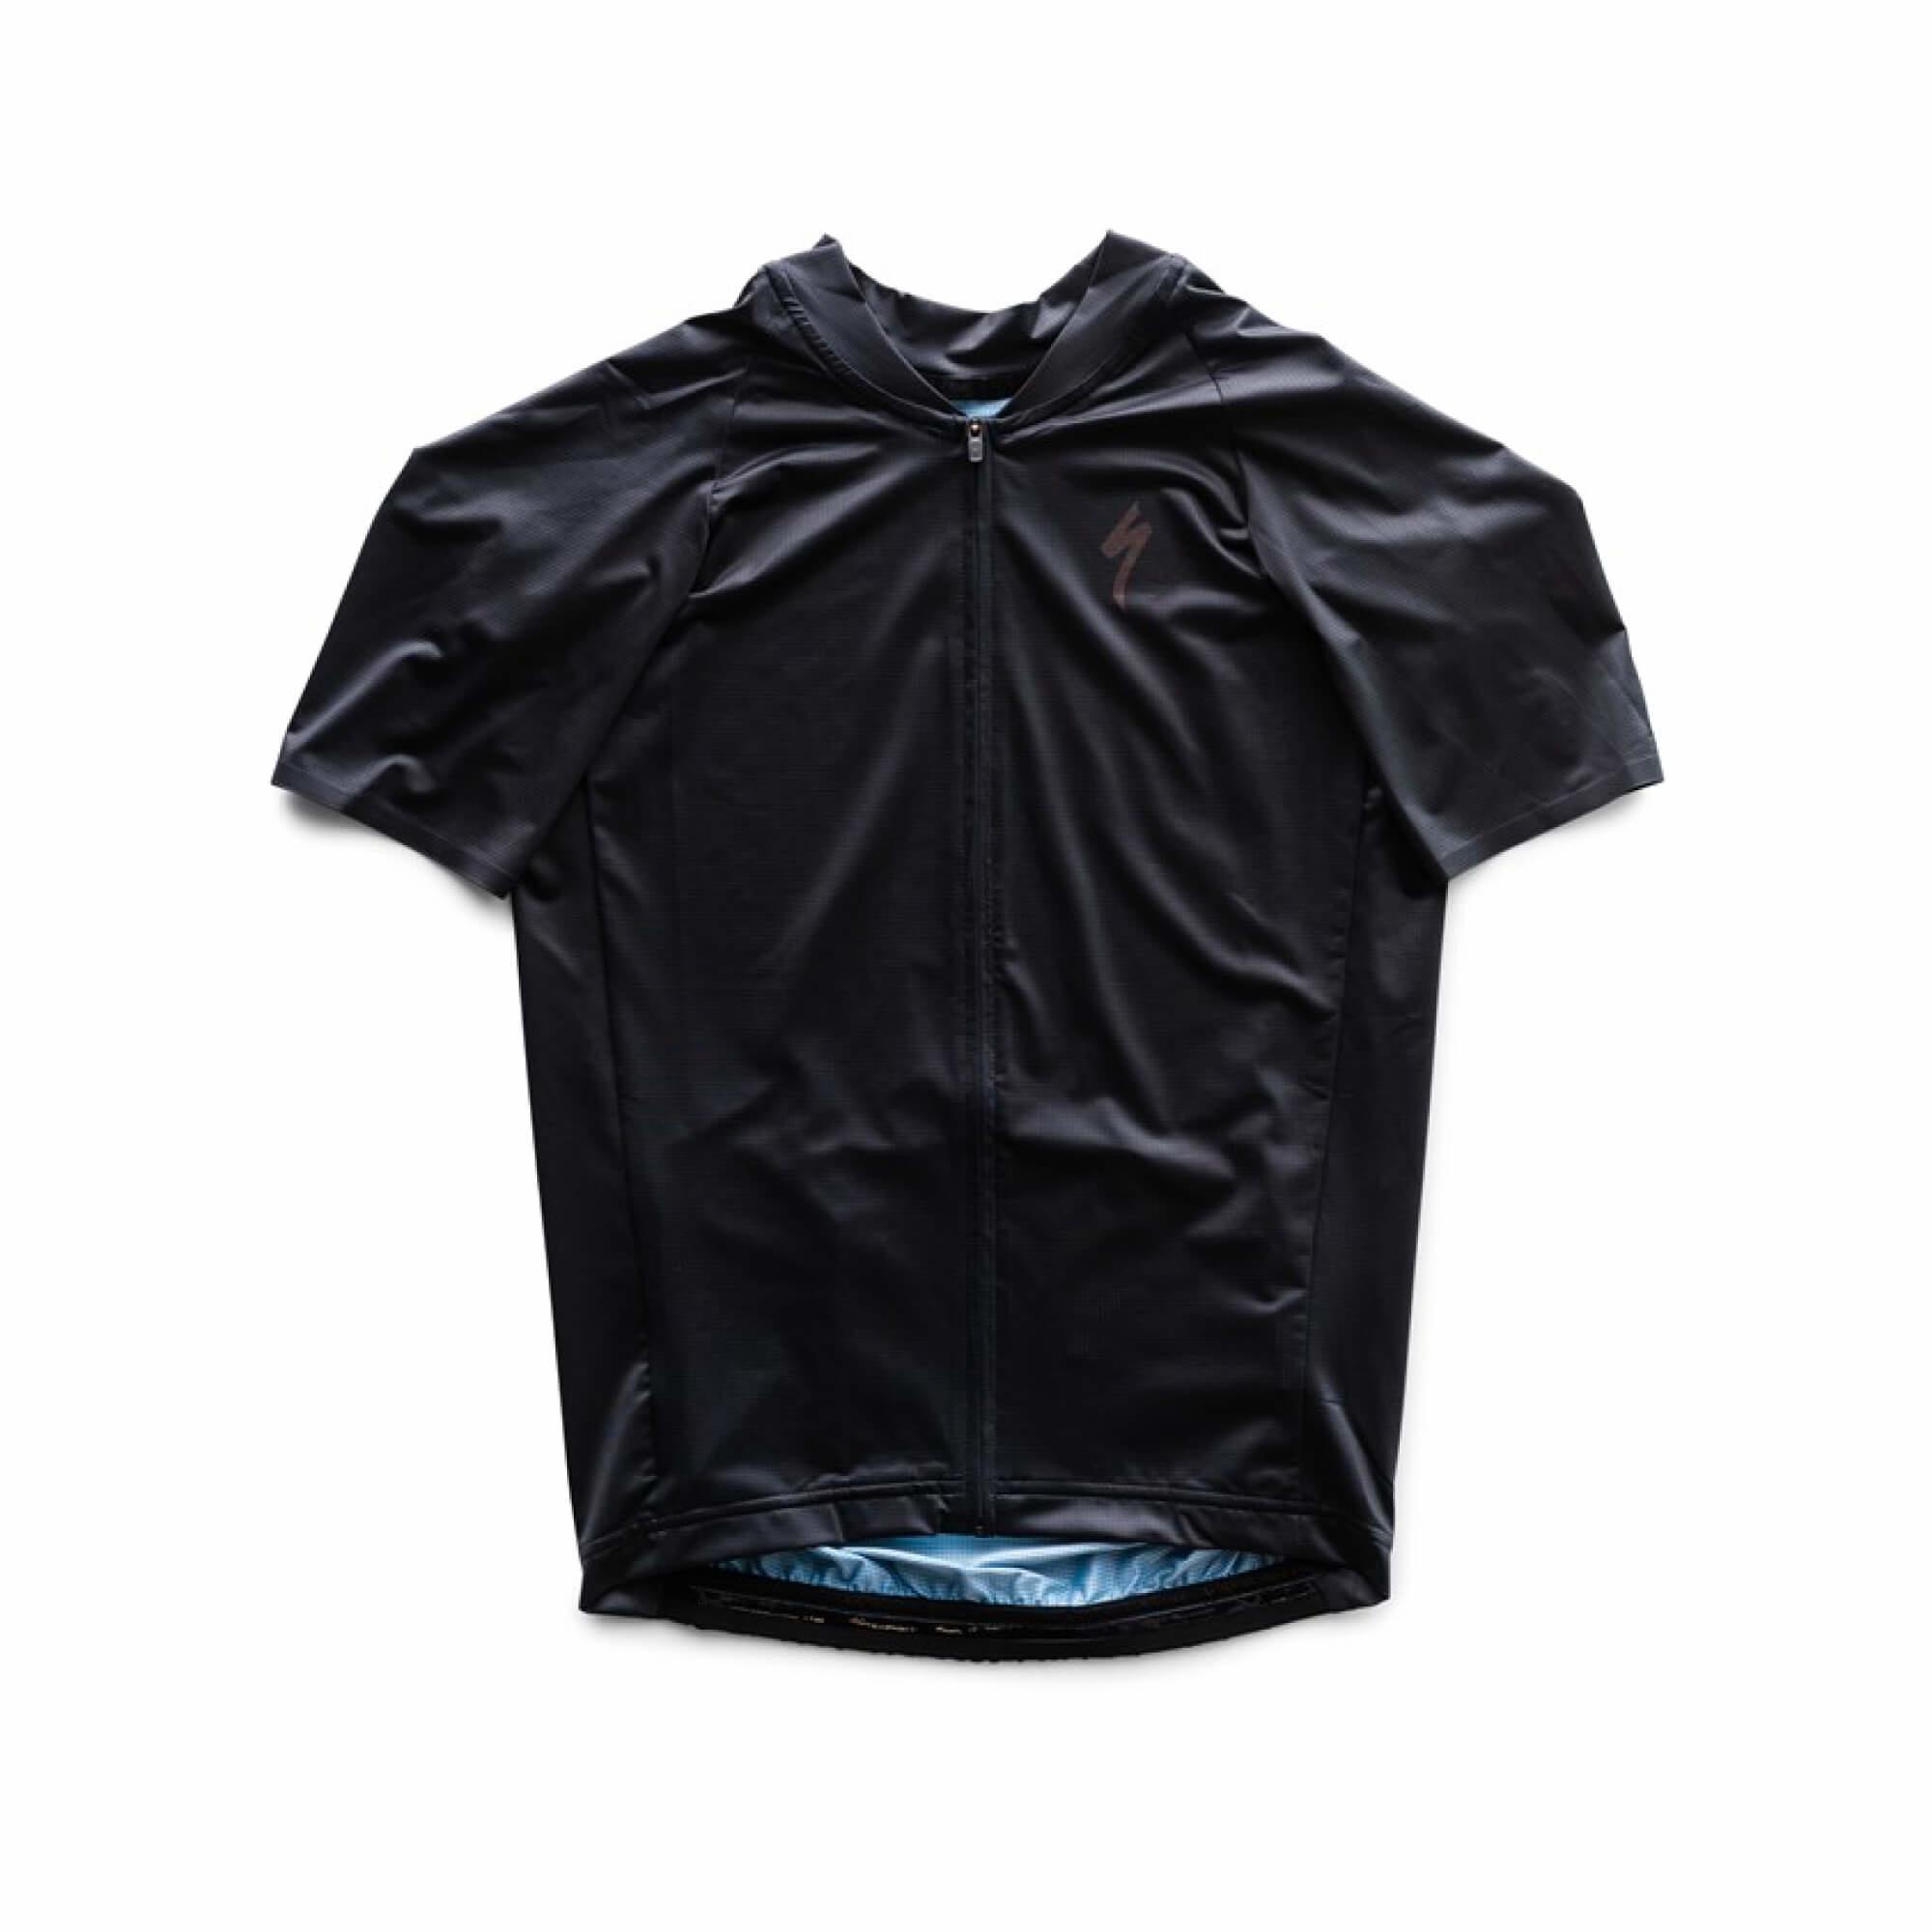 SL Air Jersey Short Sleeve-1